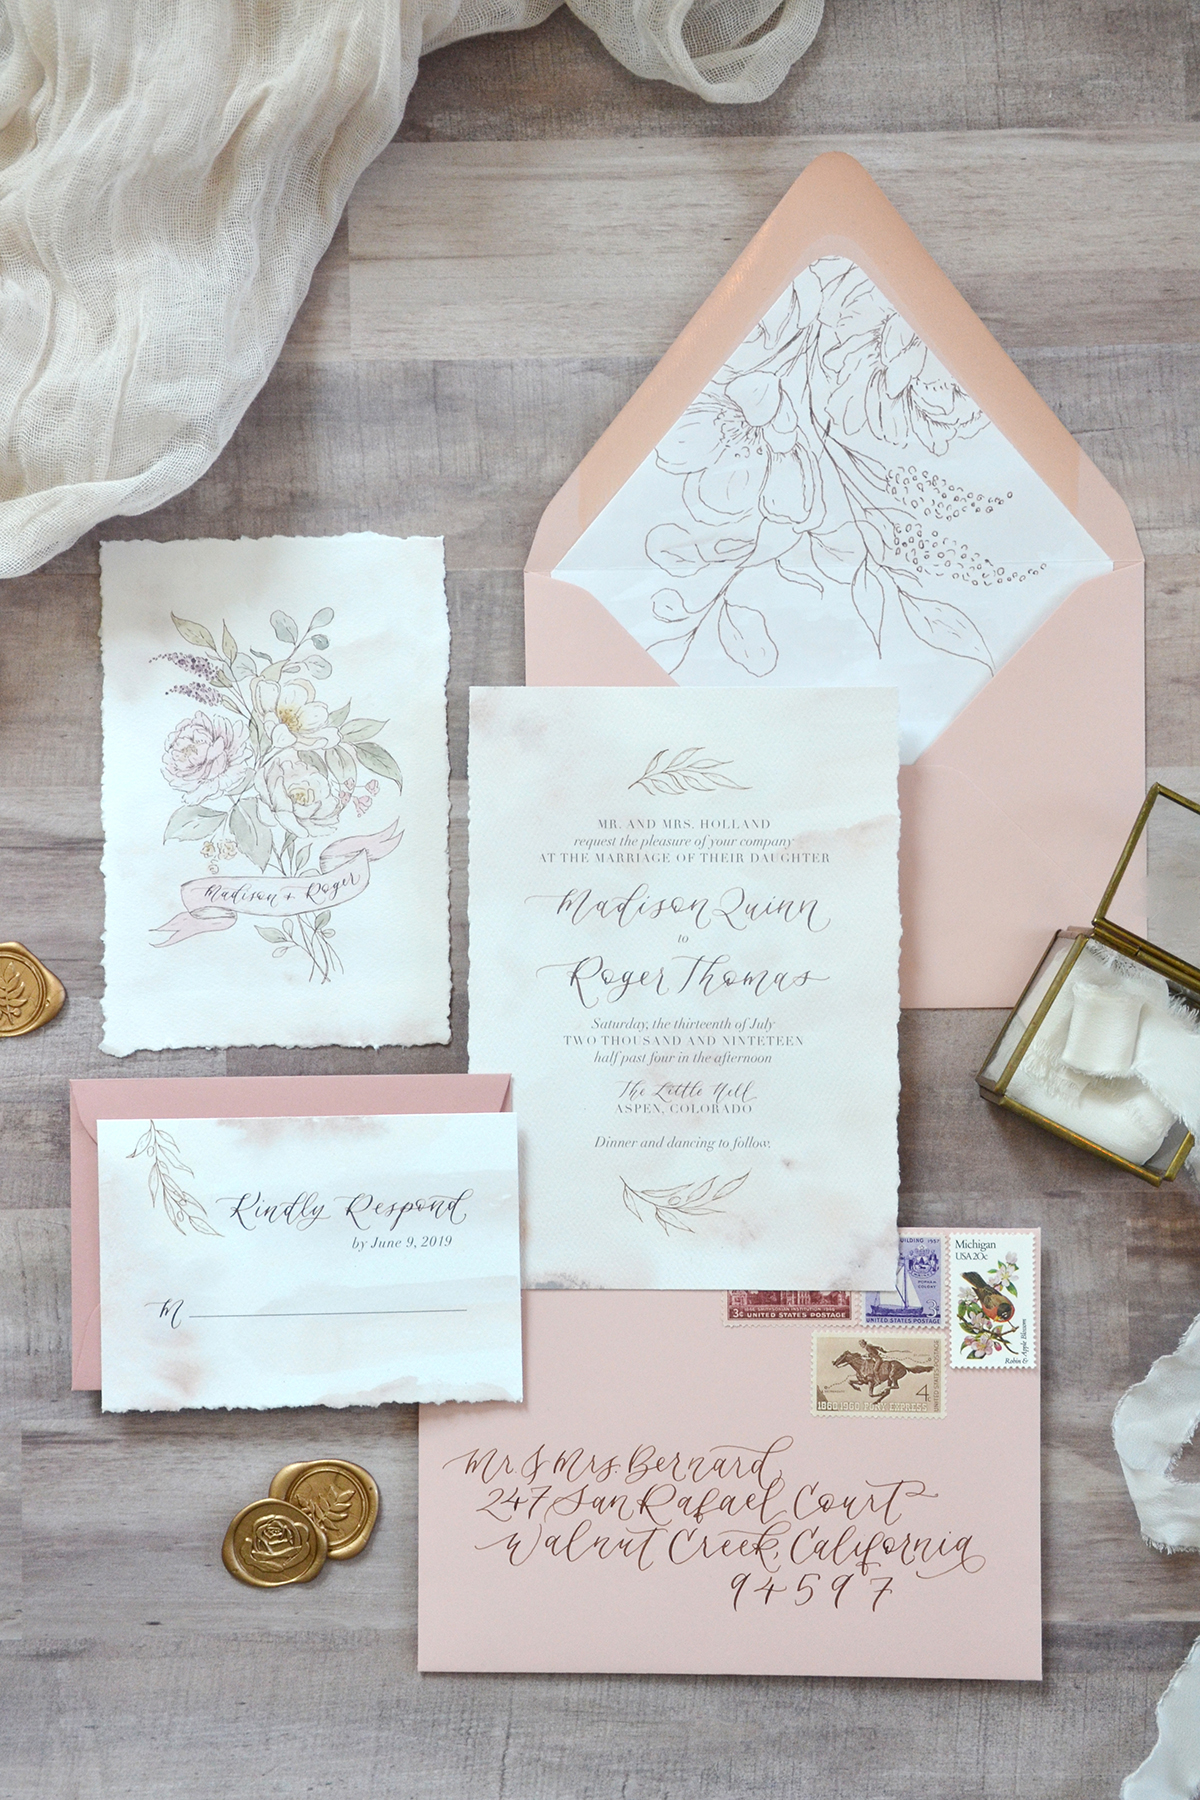 Sam Allen Creates Rose and Floral Botanical Illustrated Wedding Invitation Suite with Handtorn Edges